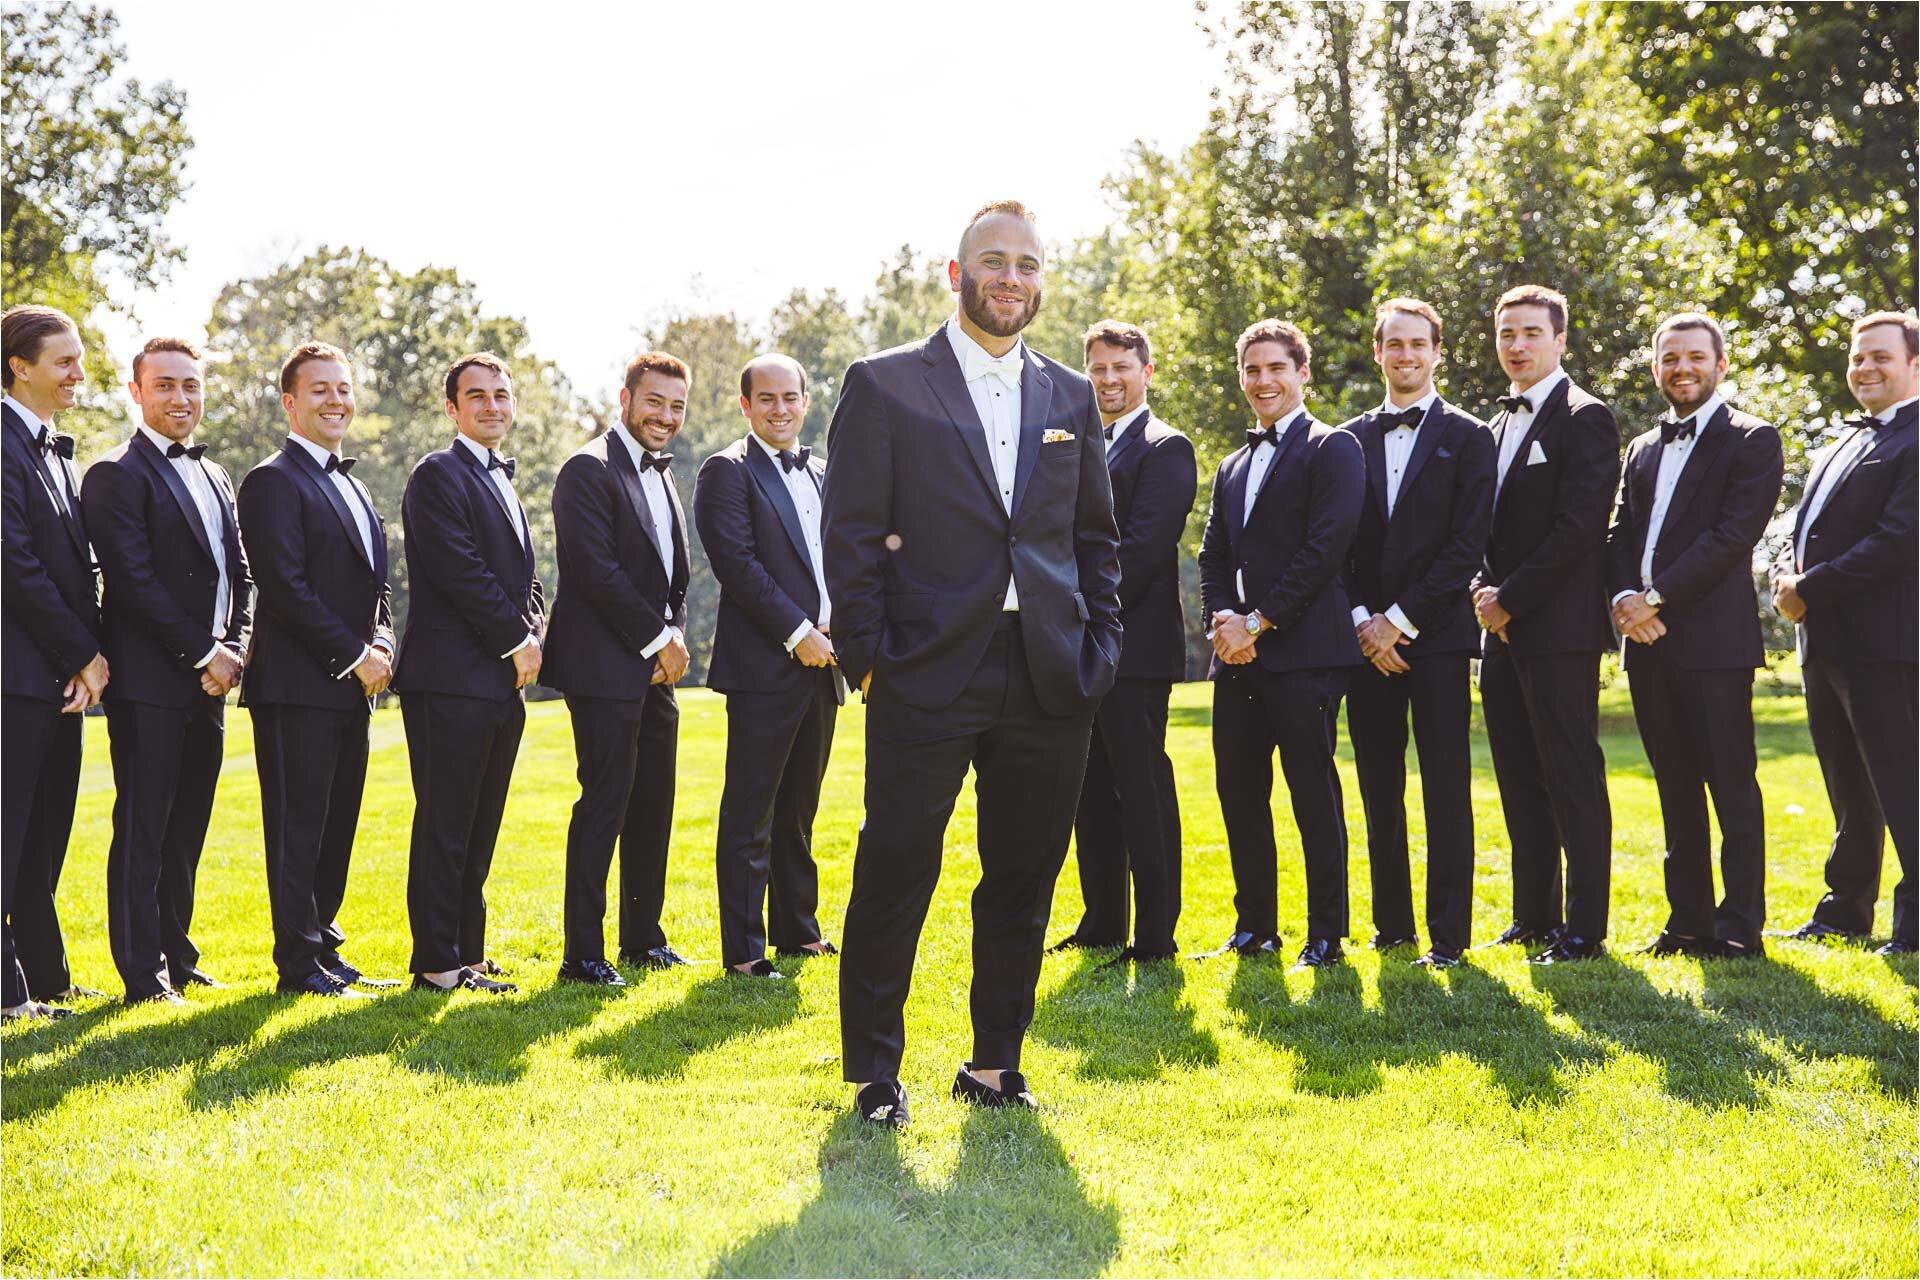 racebrook-countryclub-wedding-photography-20.jpg